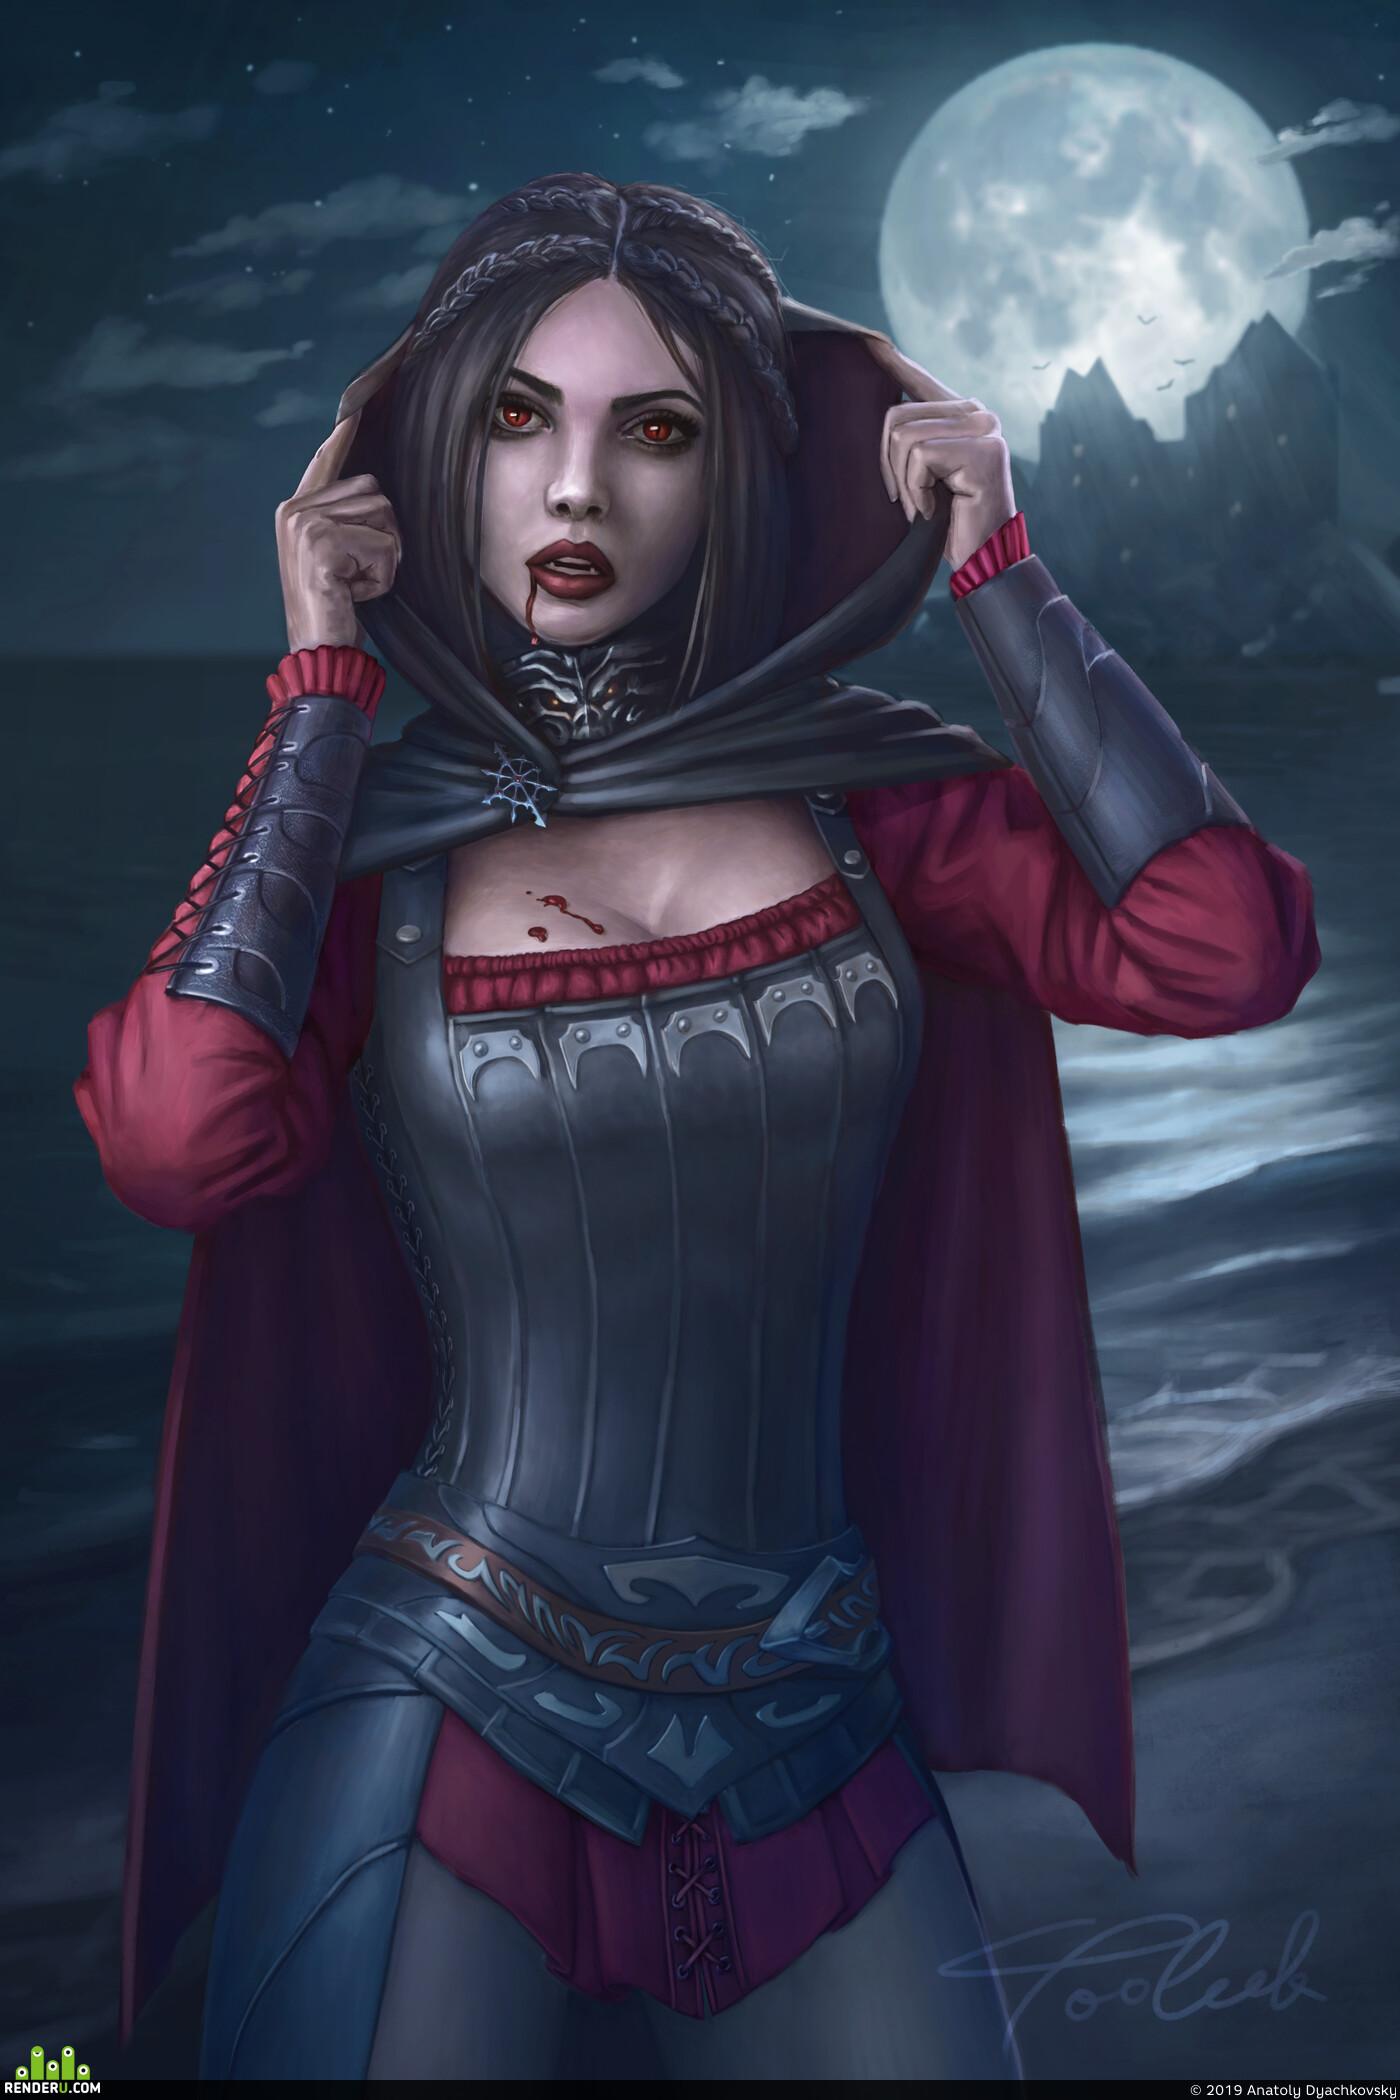 art, drawing, painting, wow, girl, vampire, serana, theElderScrolls